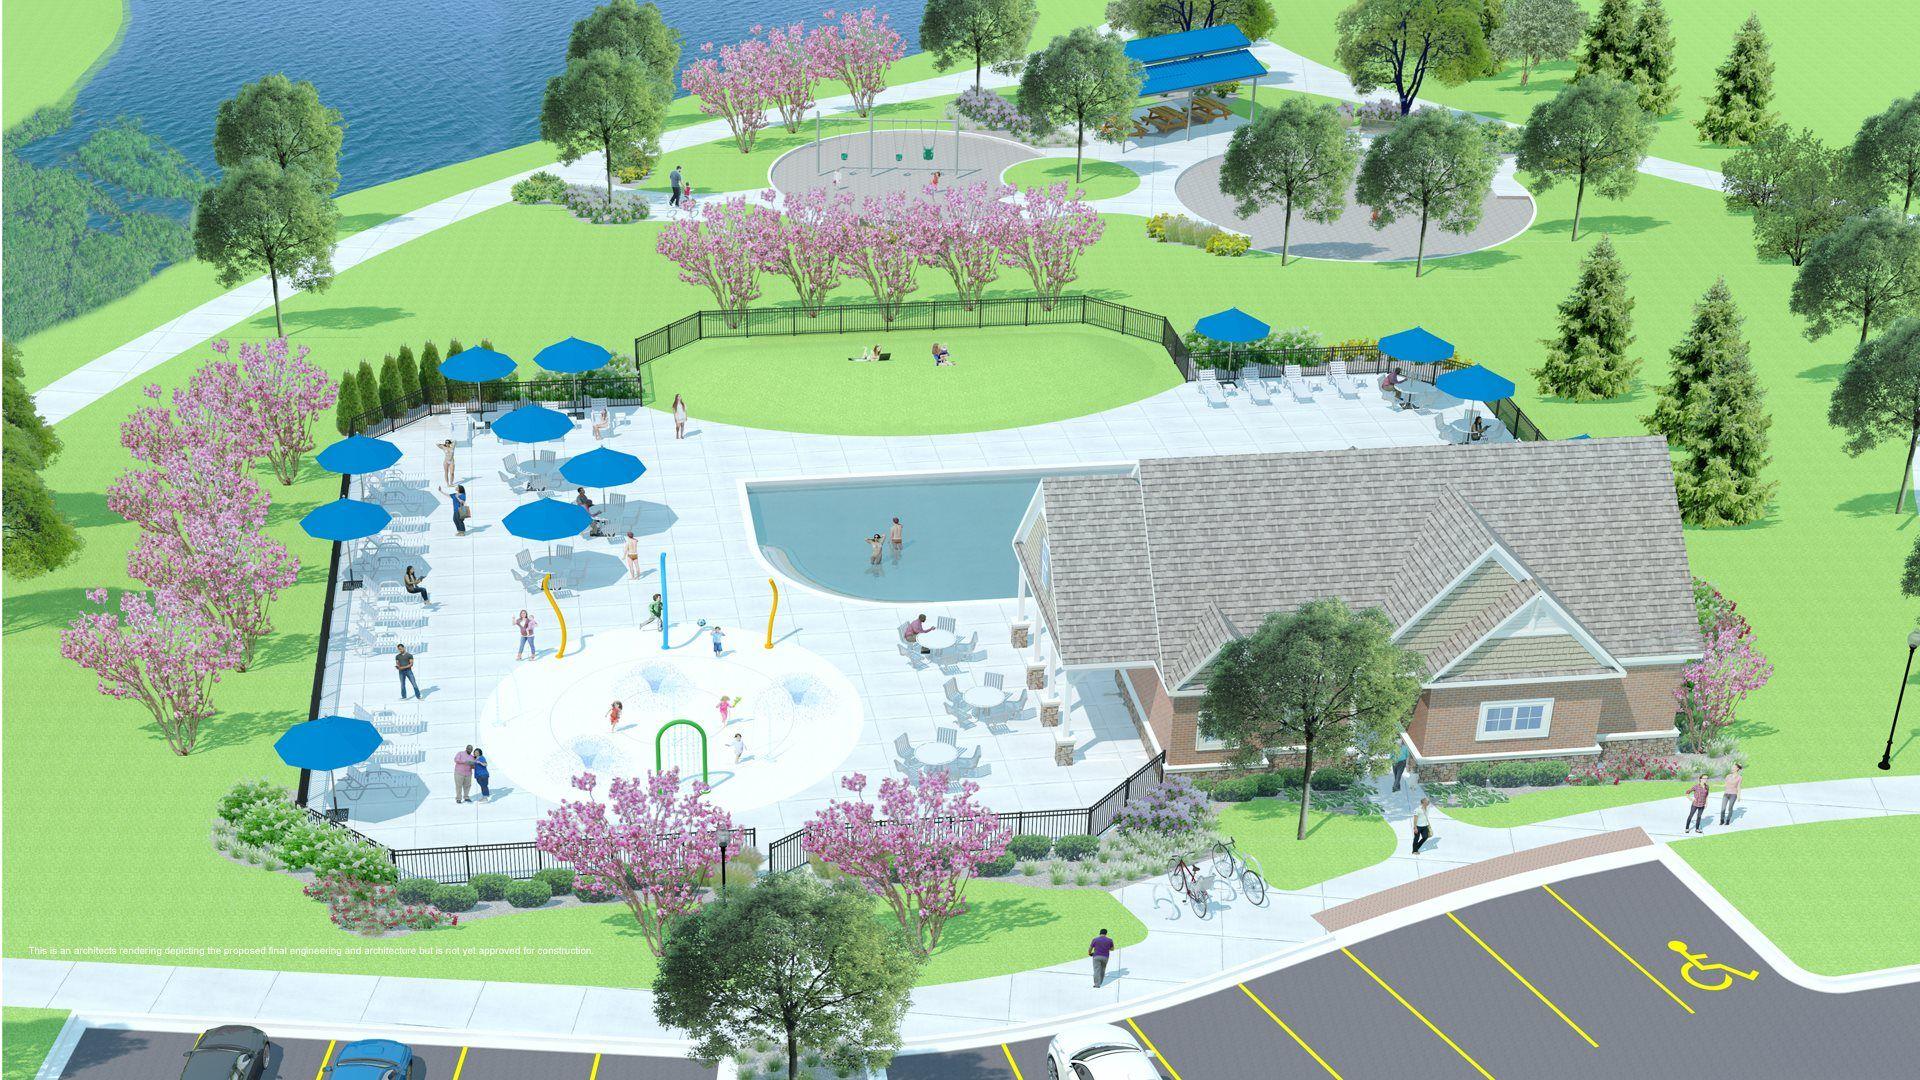 Upcoming resort-style amenities